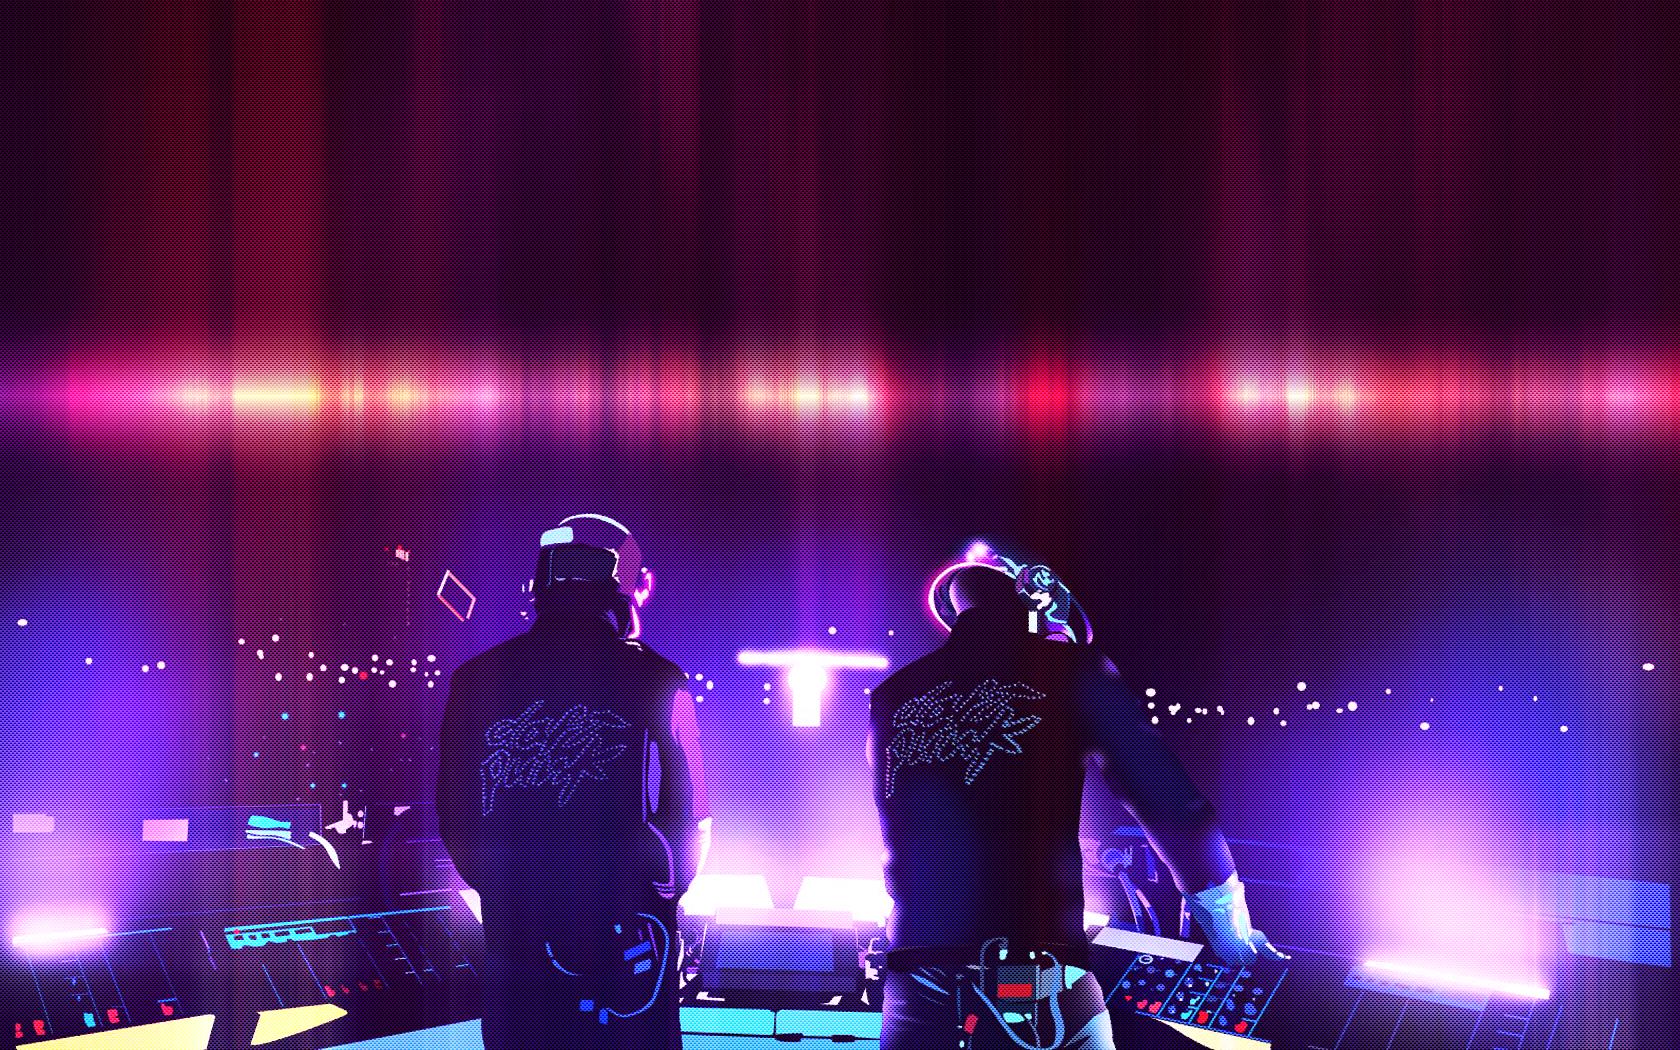 49+ Daft Punk Dual Monitor Wallpaper on WallpaperSafari